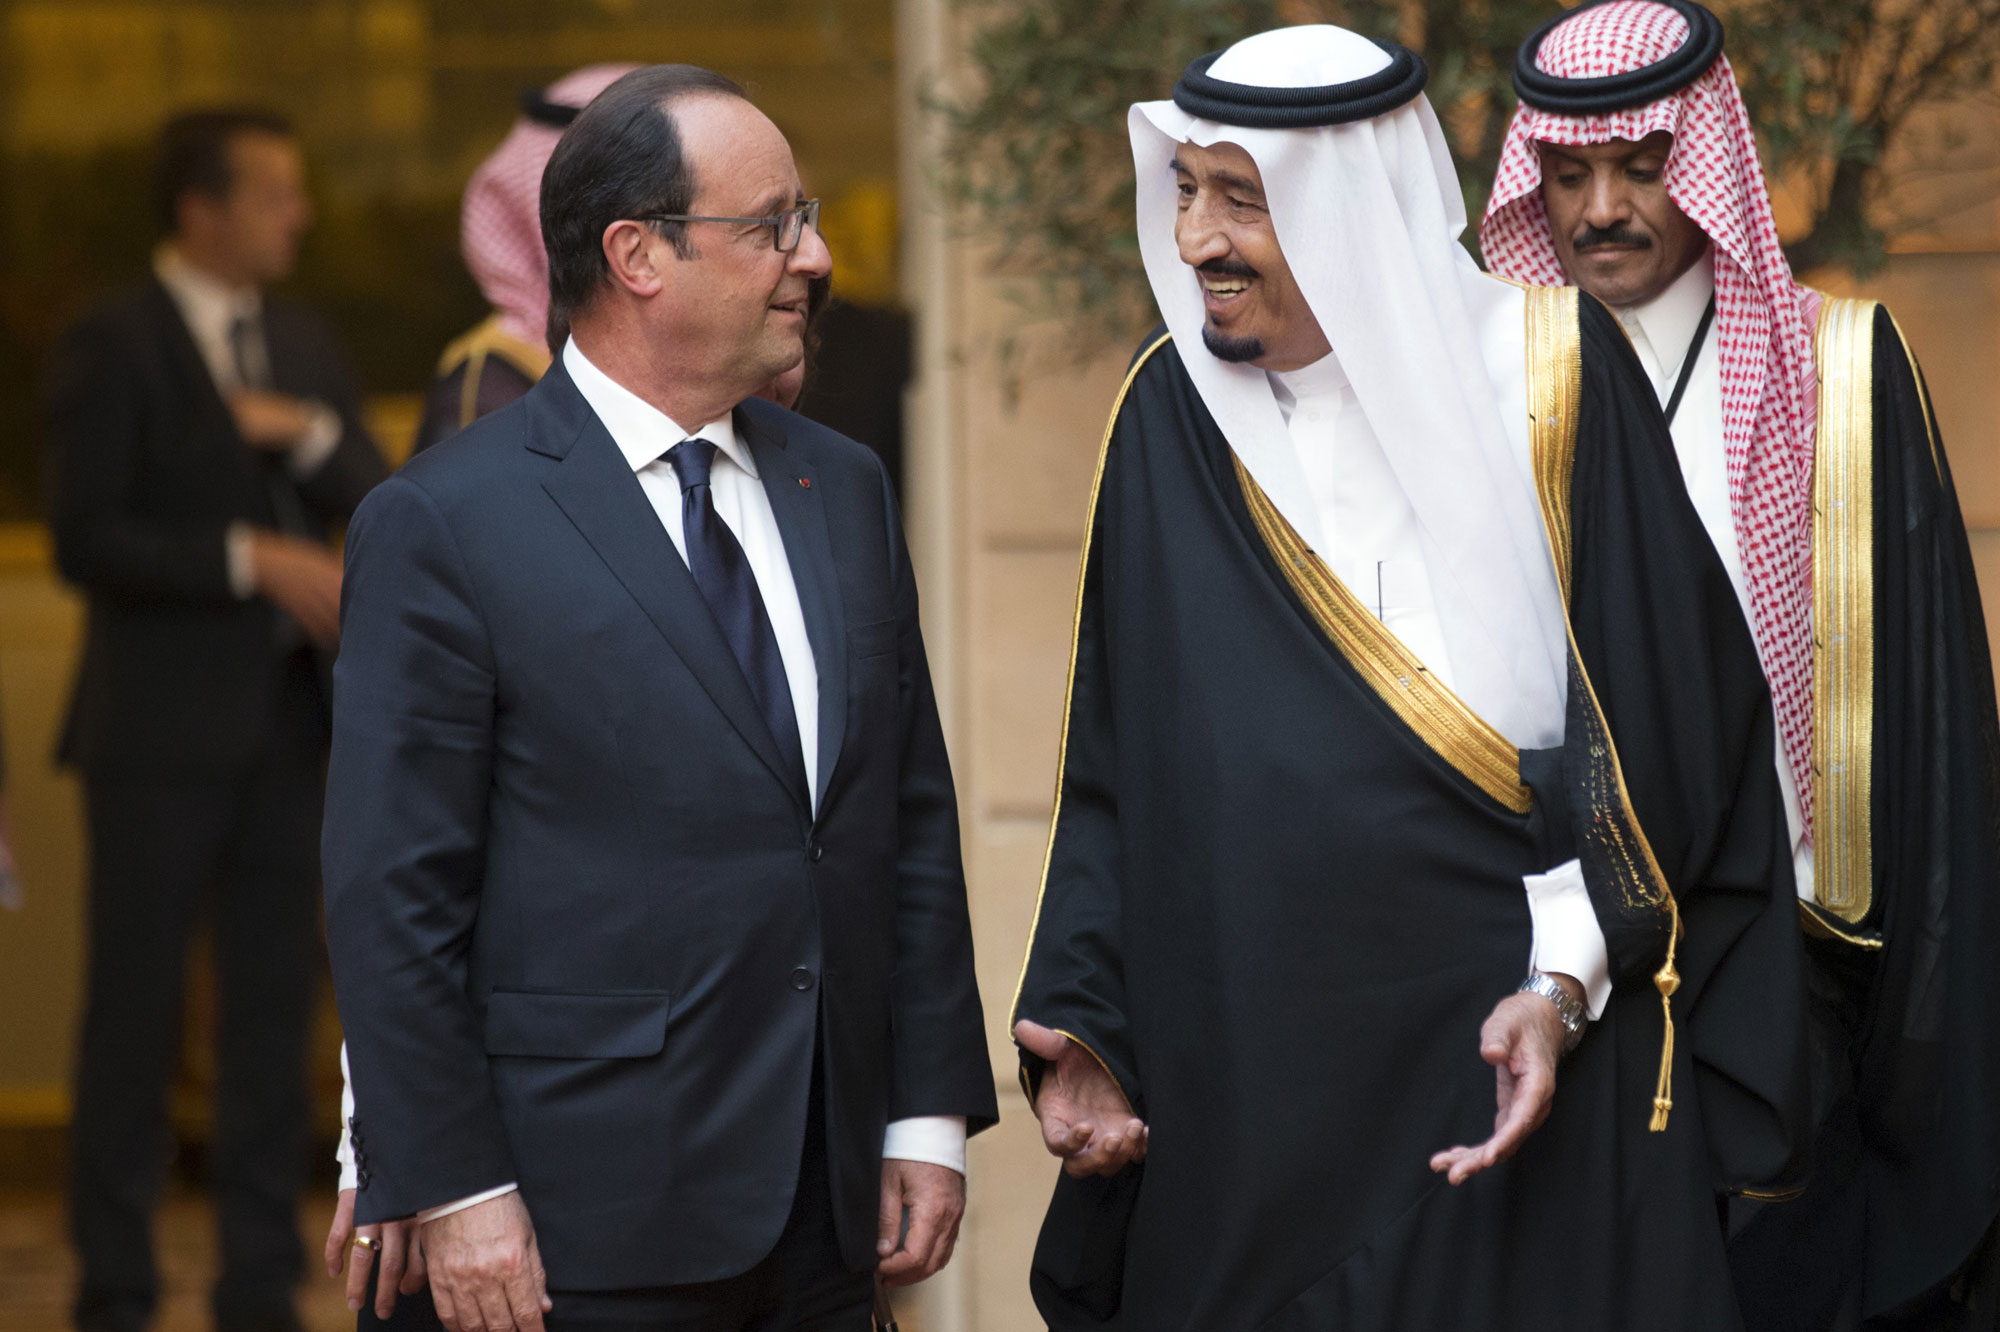 Frankrikes President François Hollande og Saudi-Arabias Kong Salman i hyggelig samtale. Foto:Philippe Wojazer / Reuters